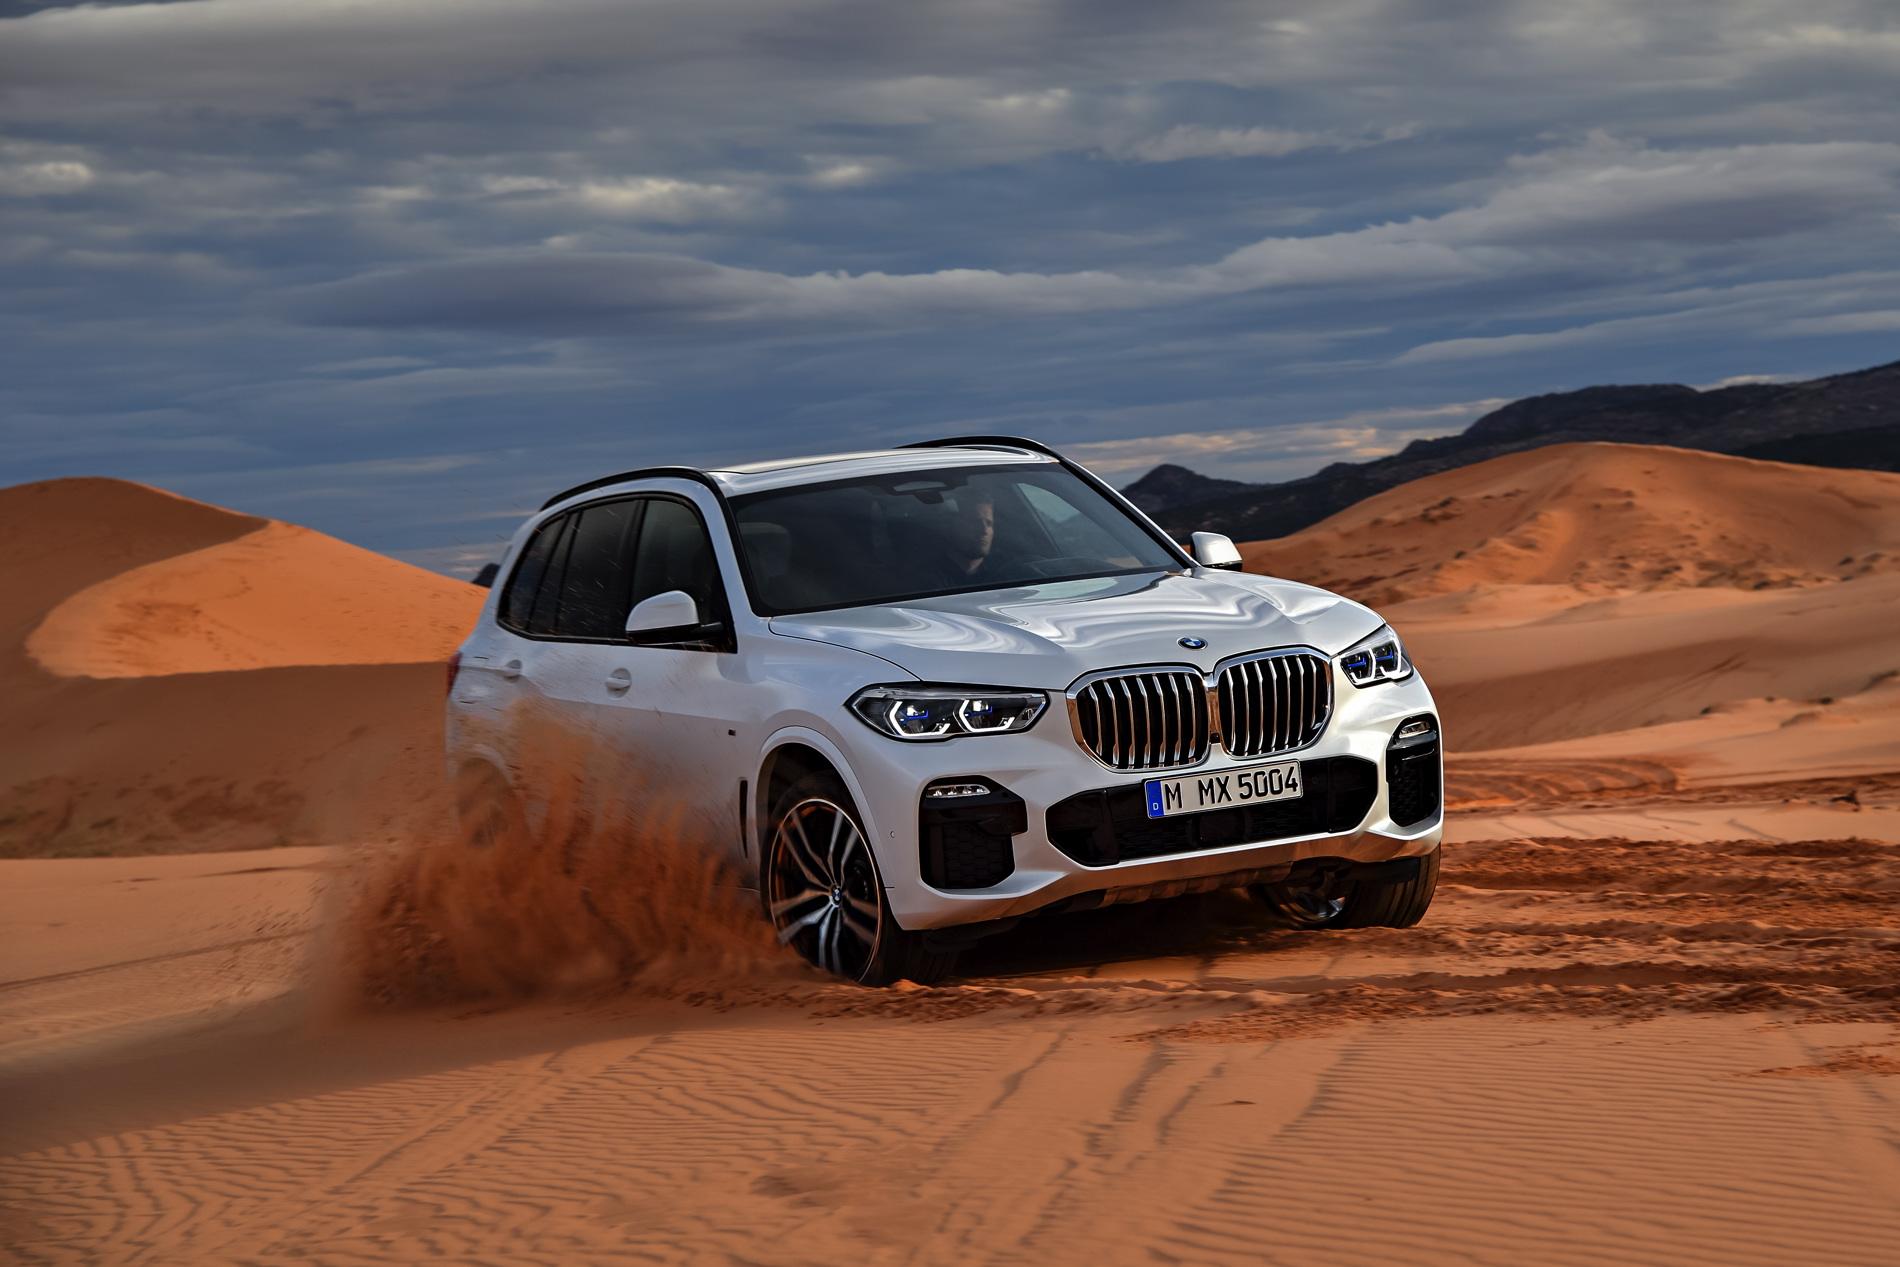 2018 BMW G05 X5 exterior 04